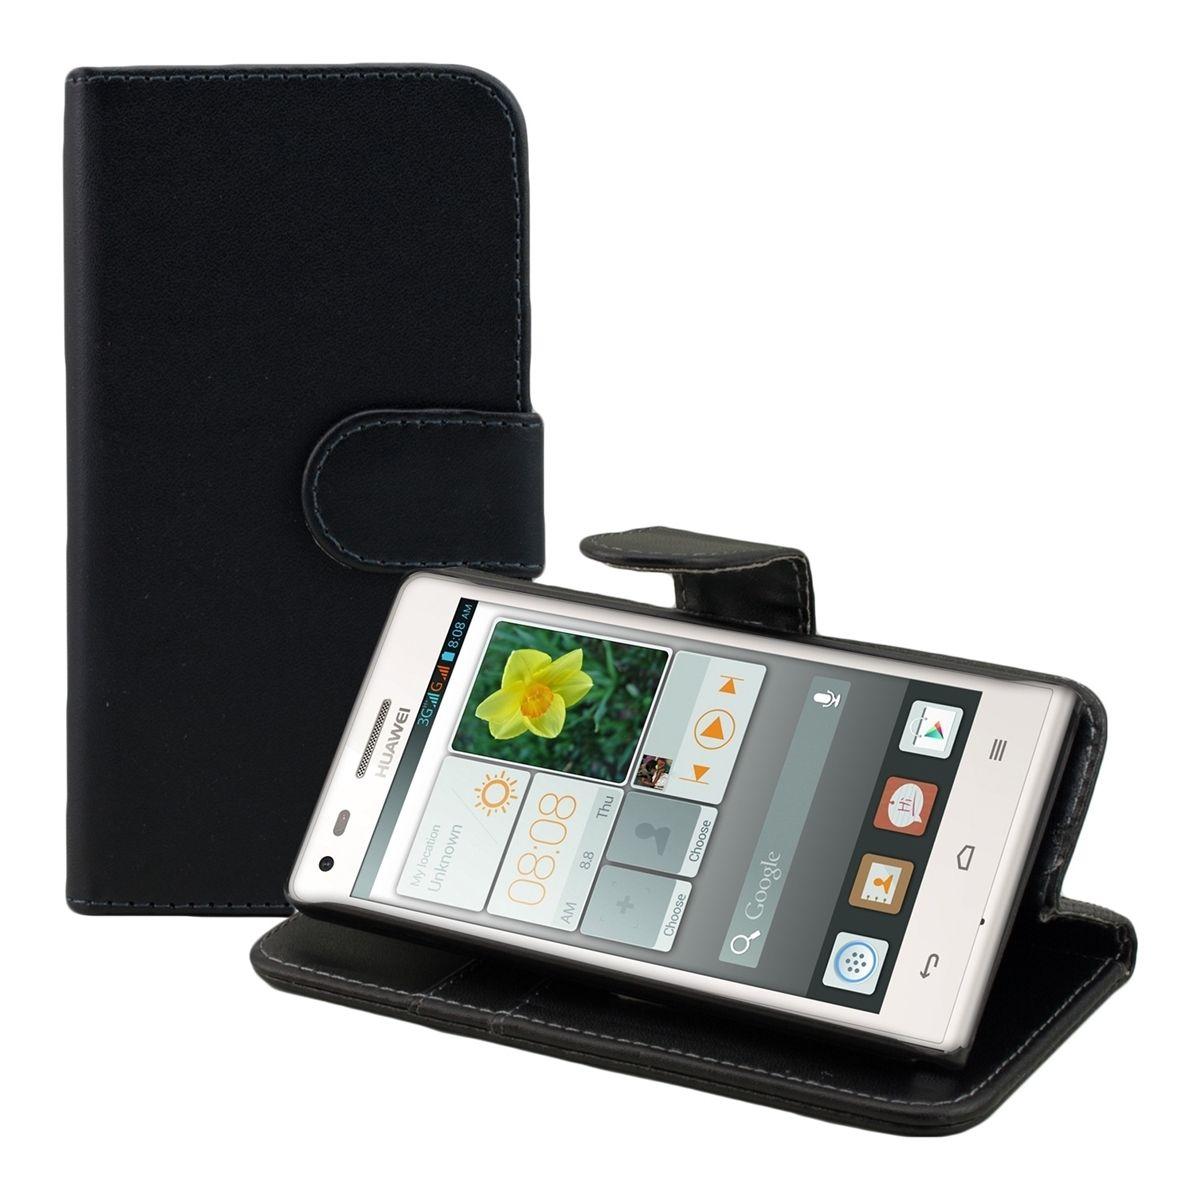 Pouzdro pro Huawei Ascend G6 (3G) černé